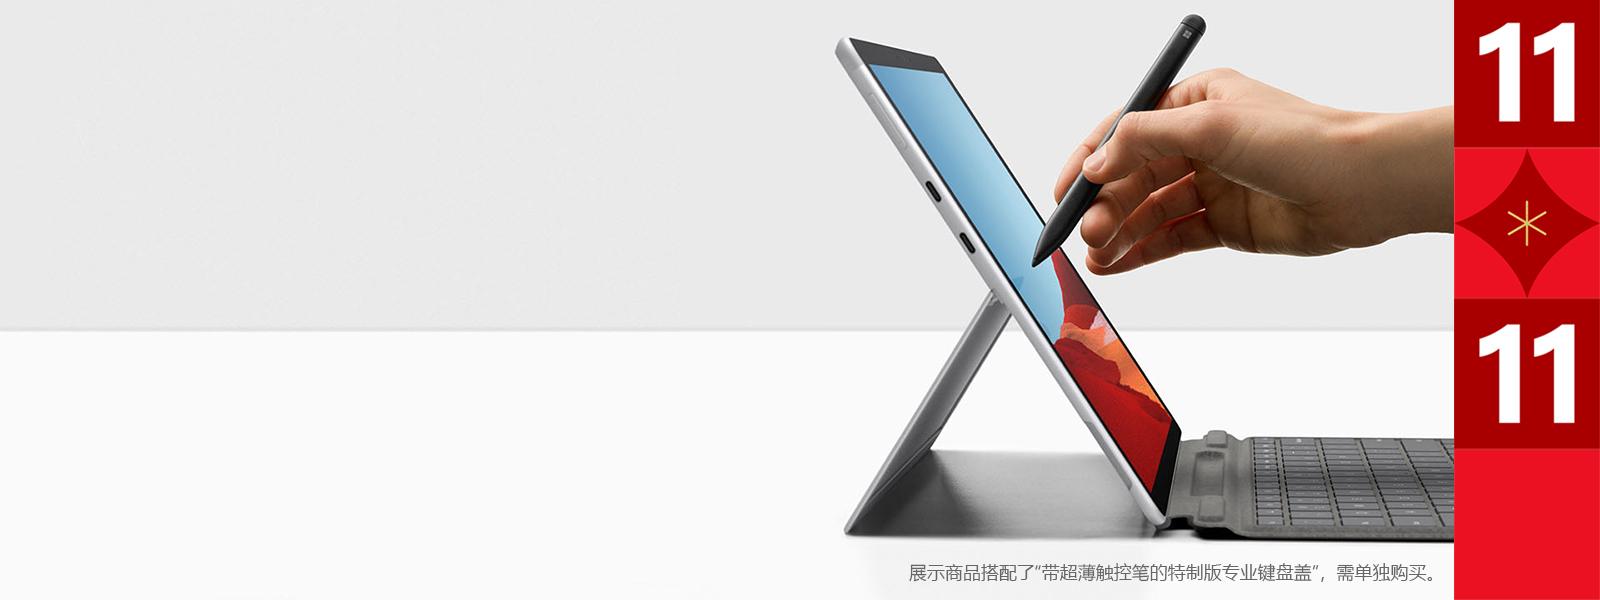 全新 Surface Pro X